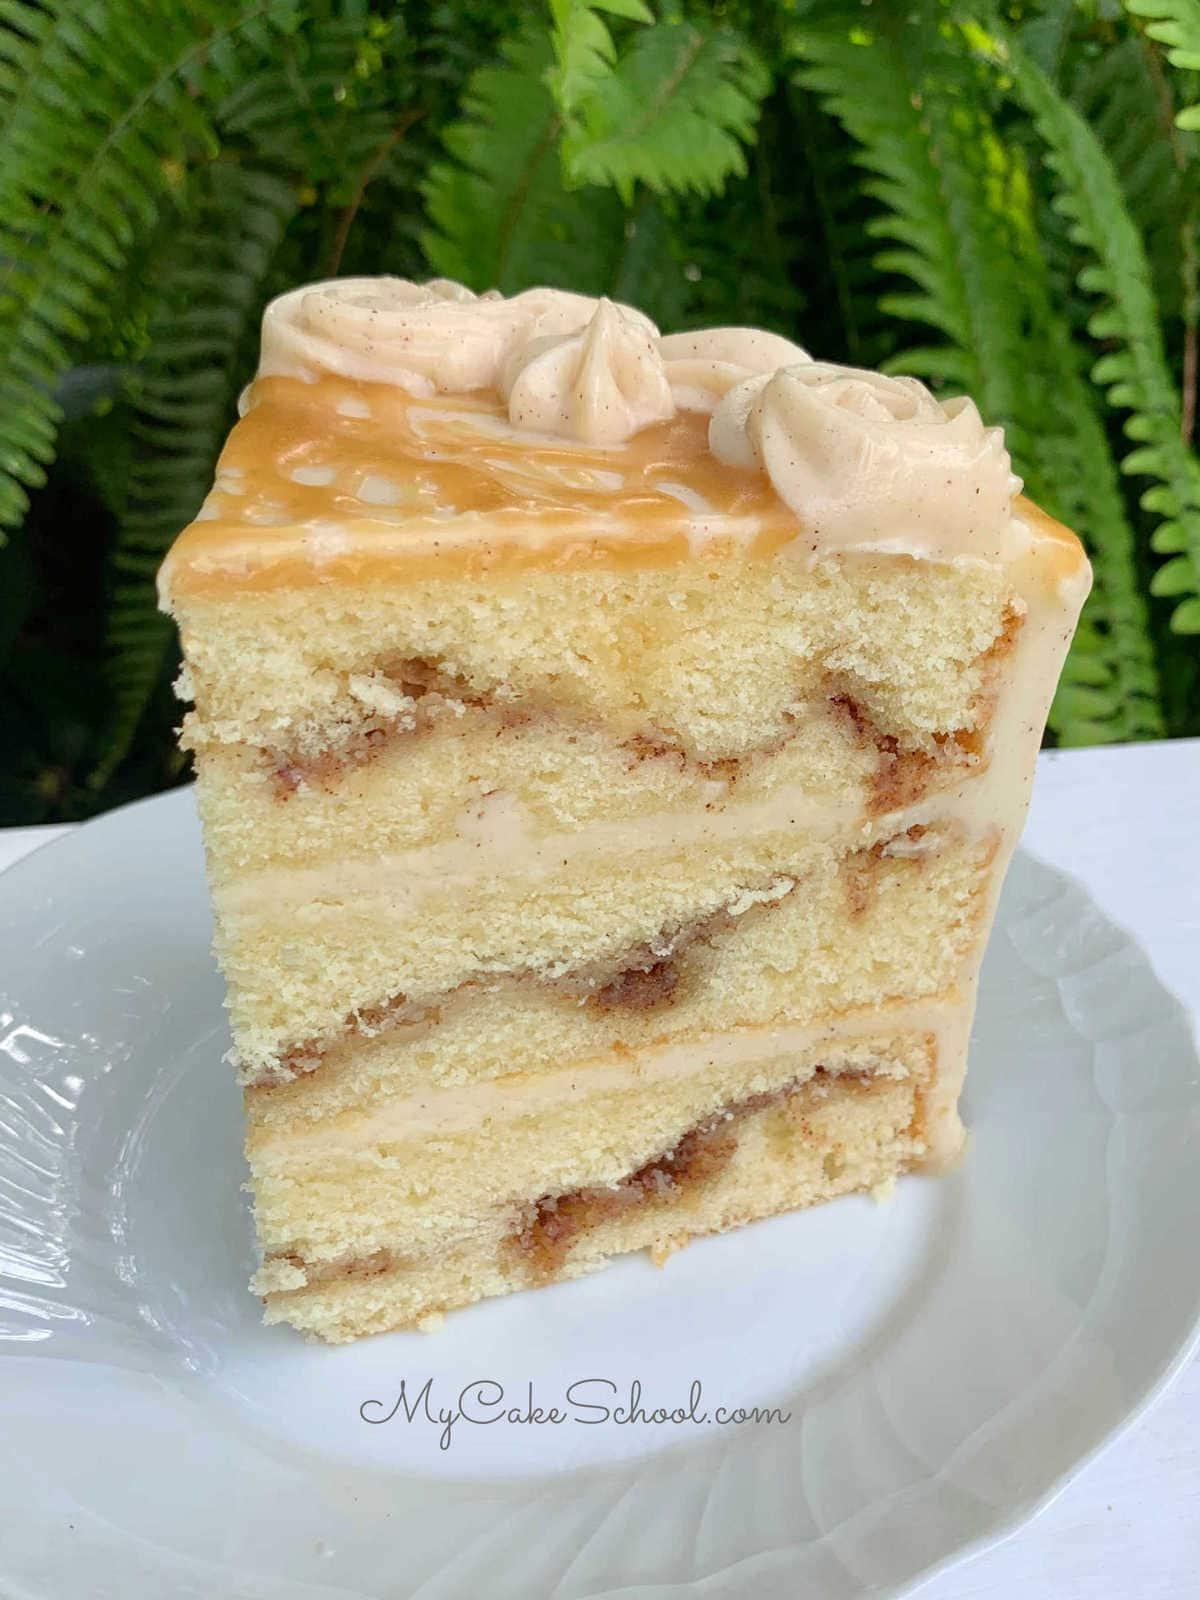 Delicious Snickerdoodle Cake Recipe